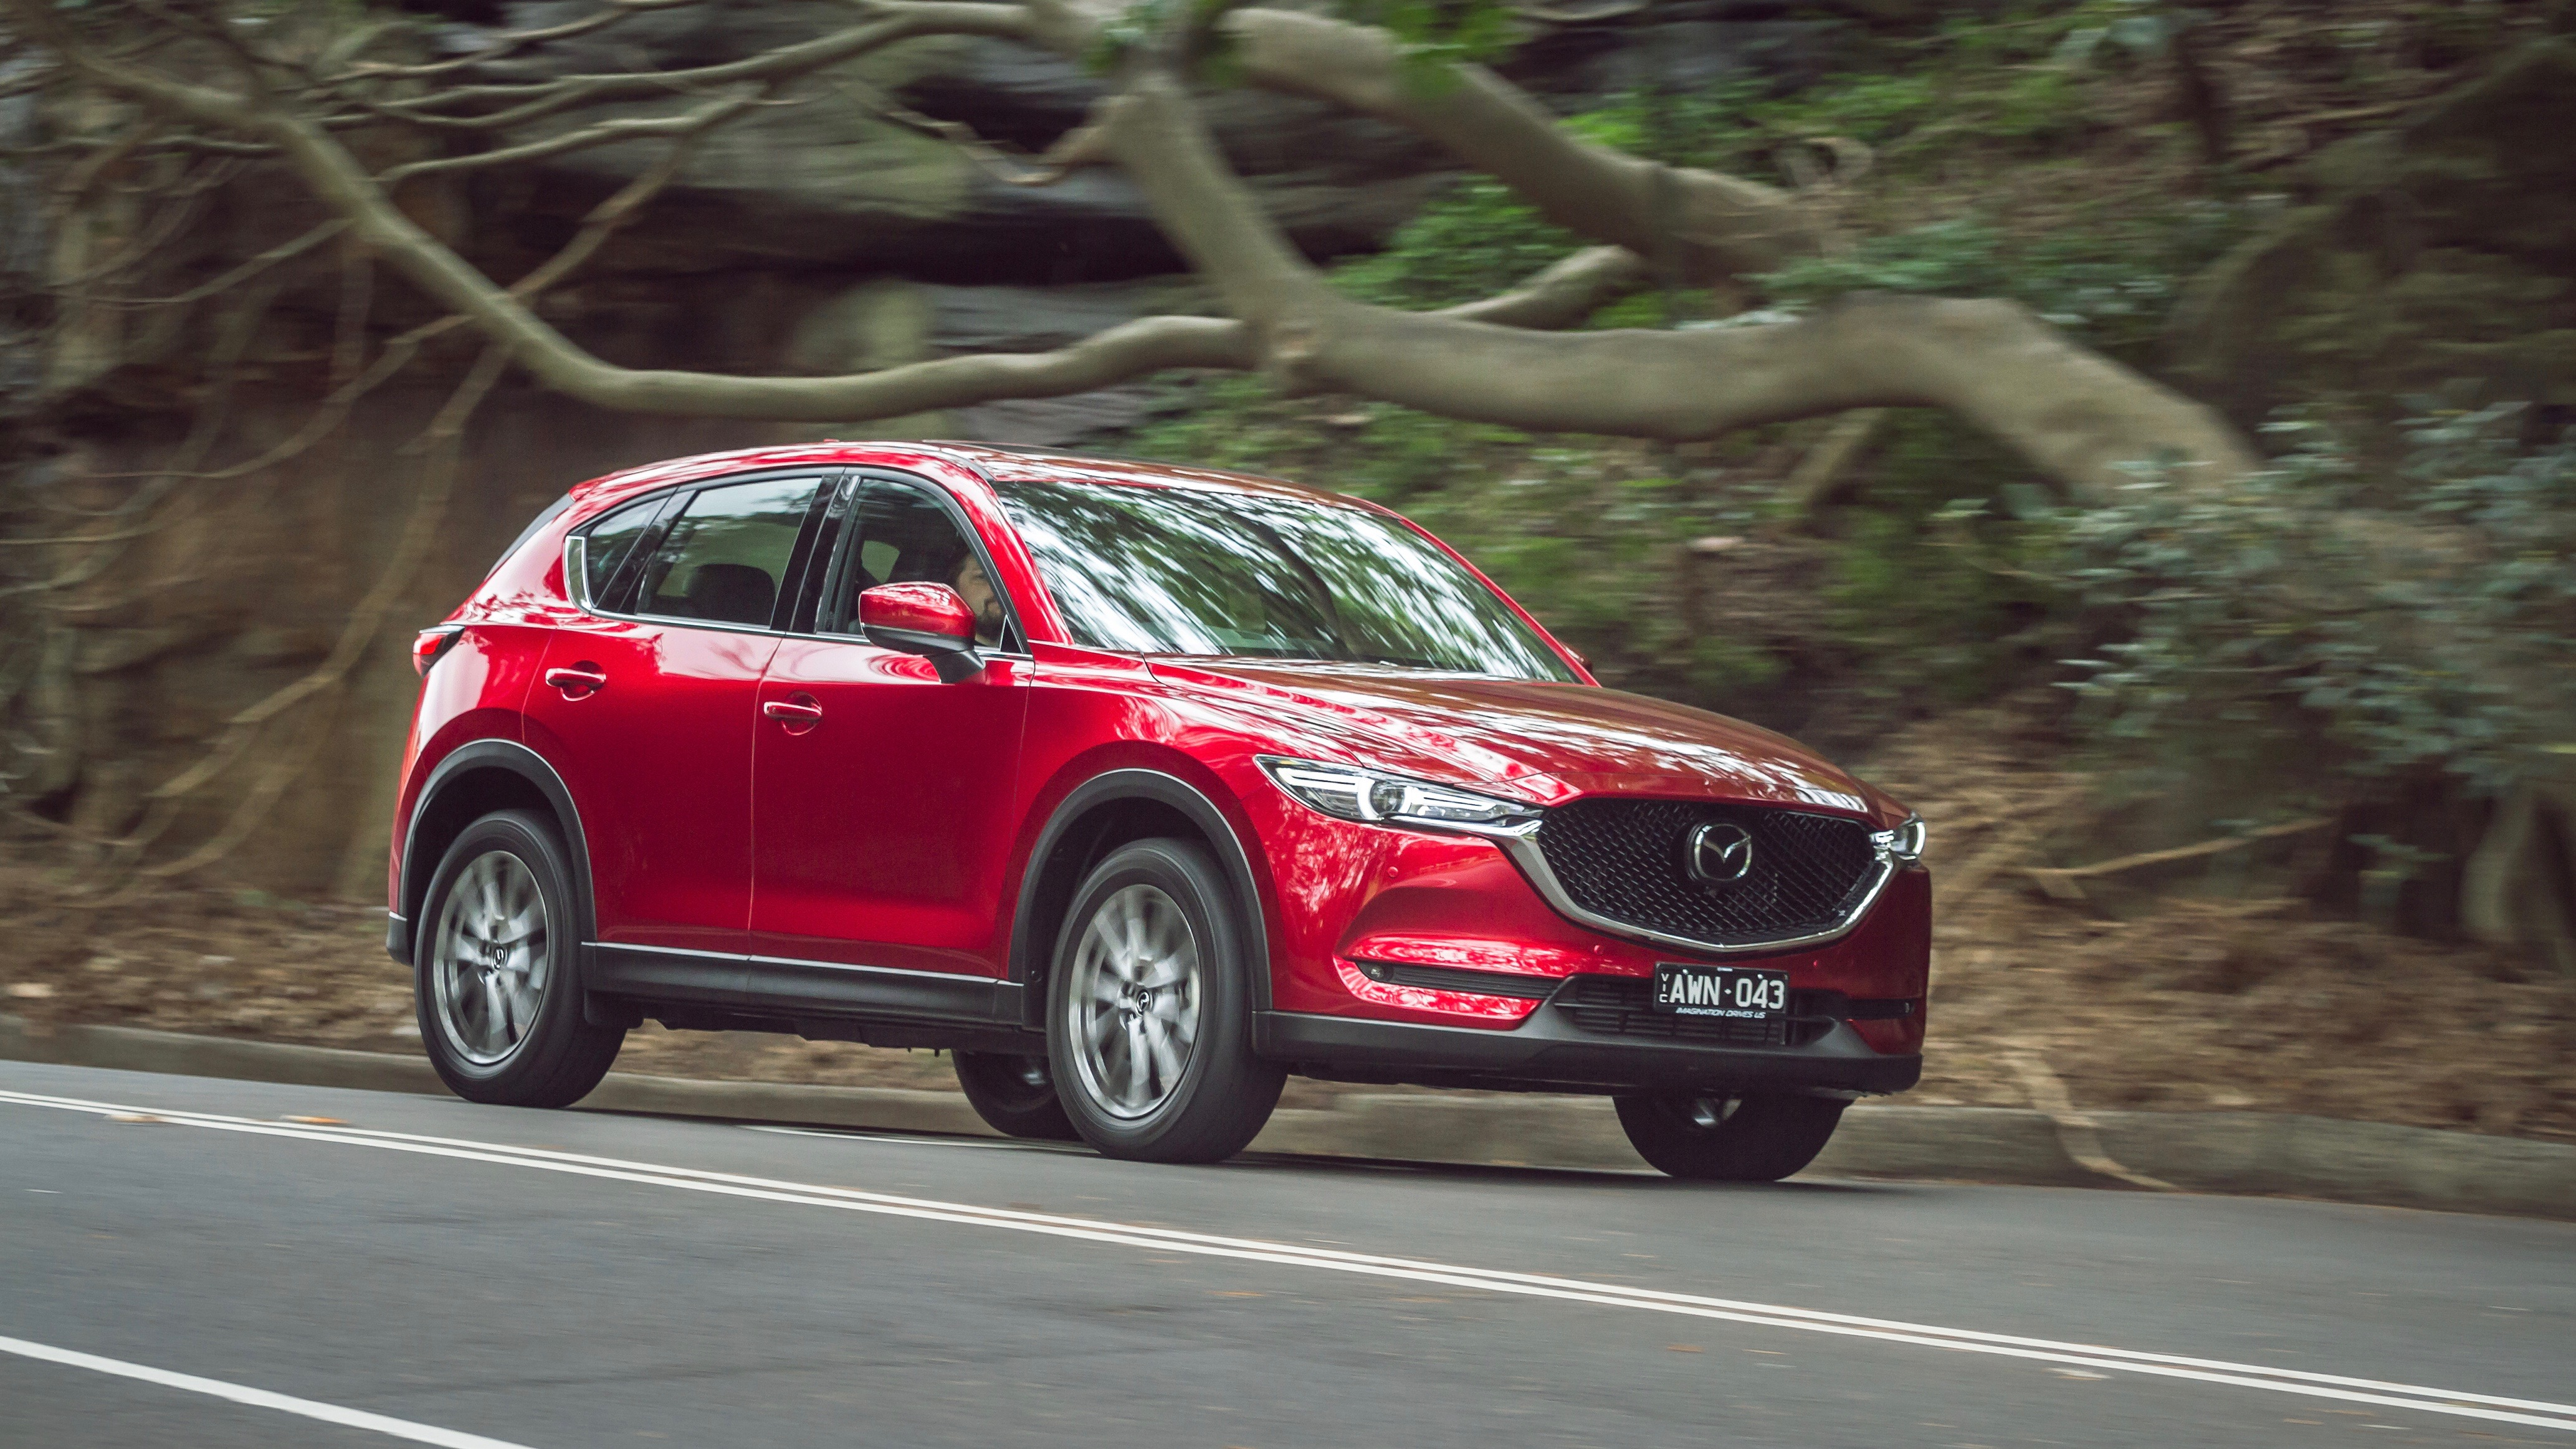 2019 Mazda CX-5 Akera Soul Red Crystal driving